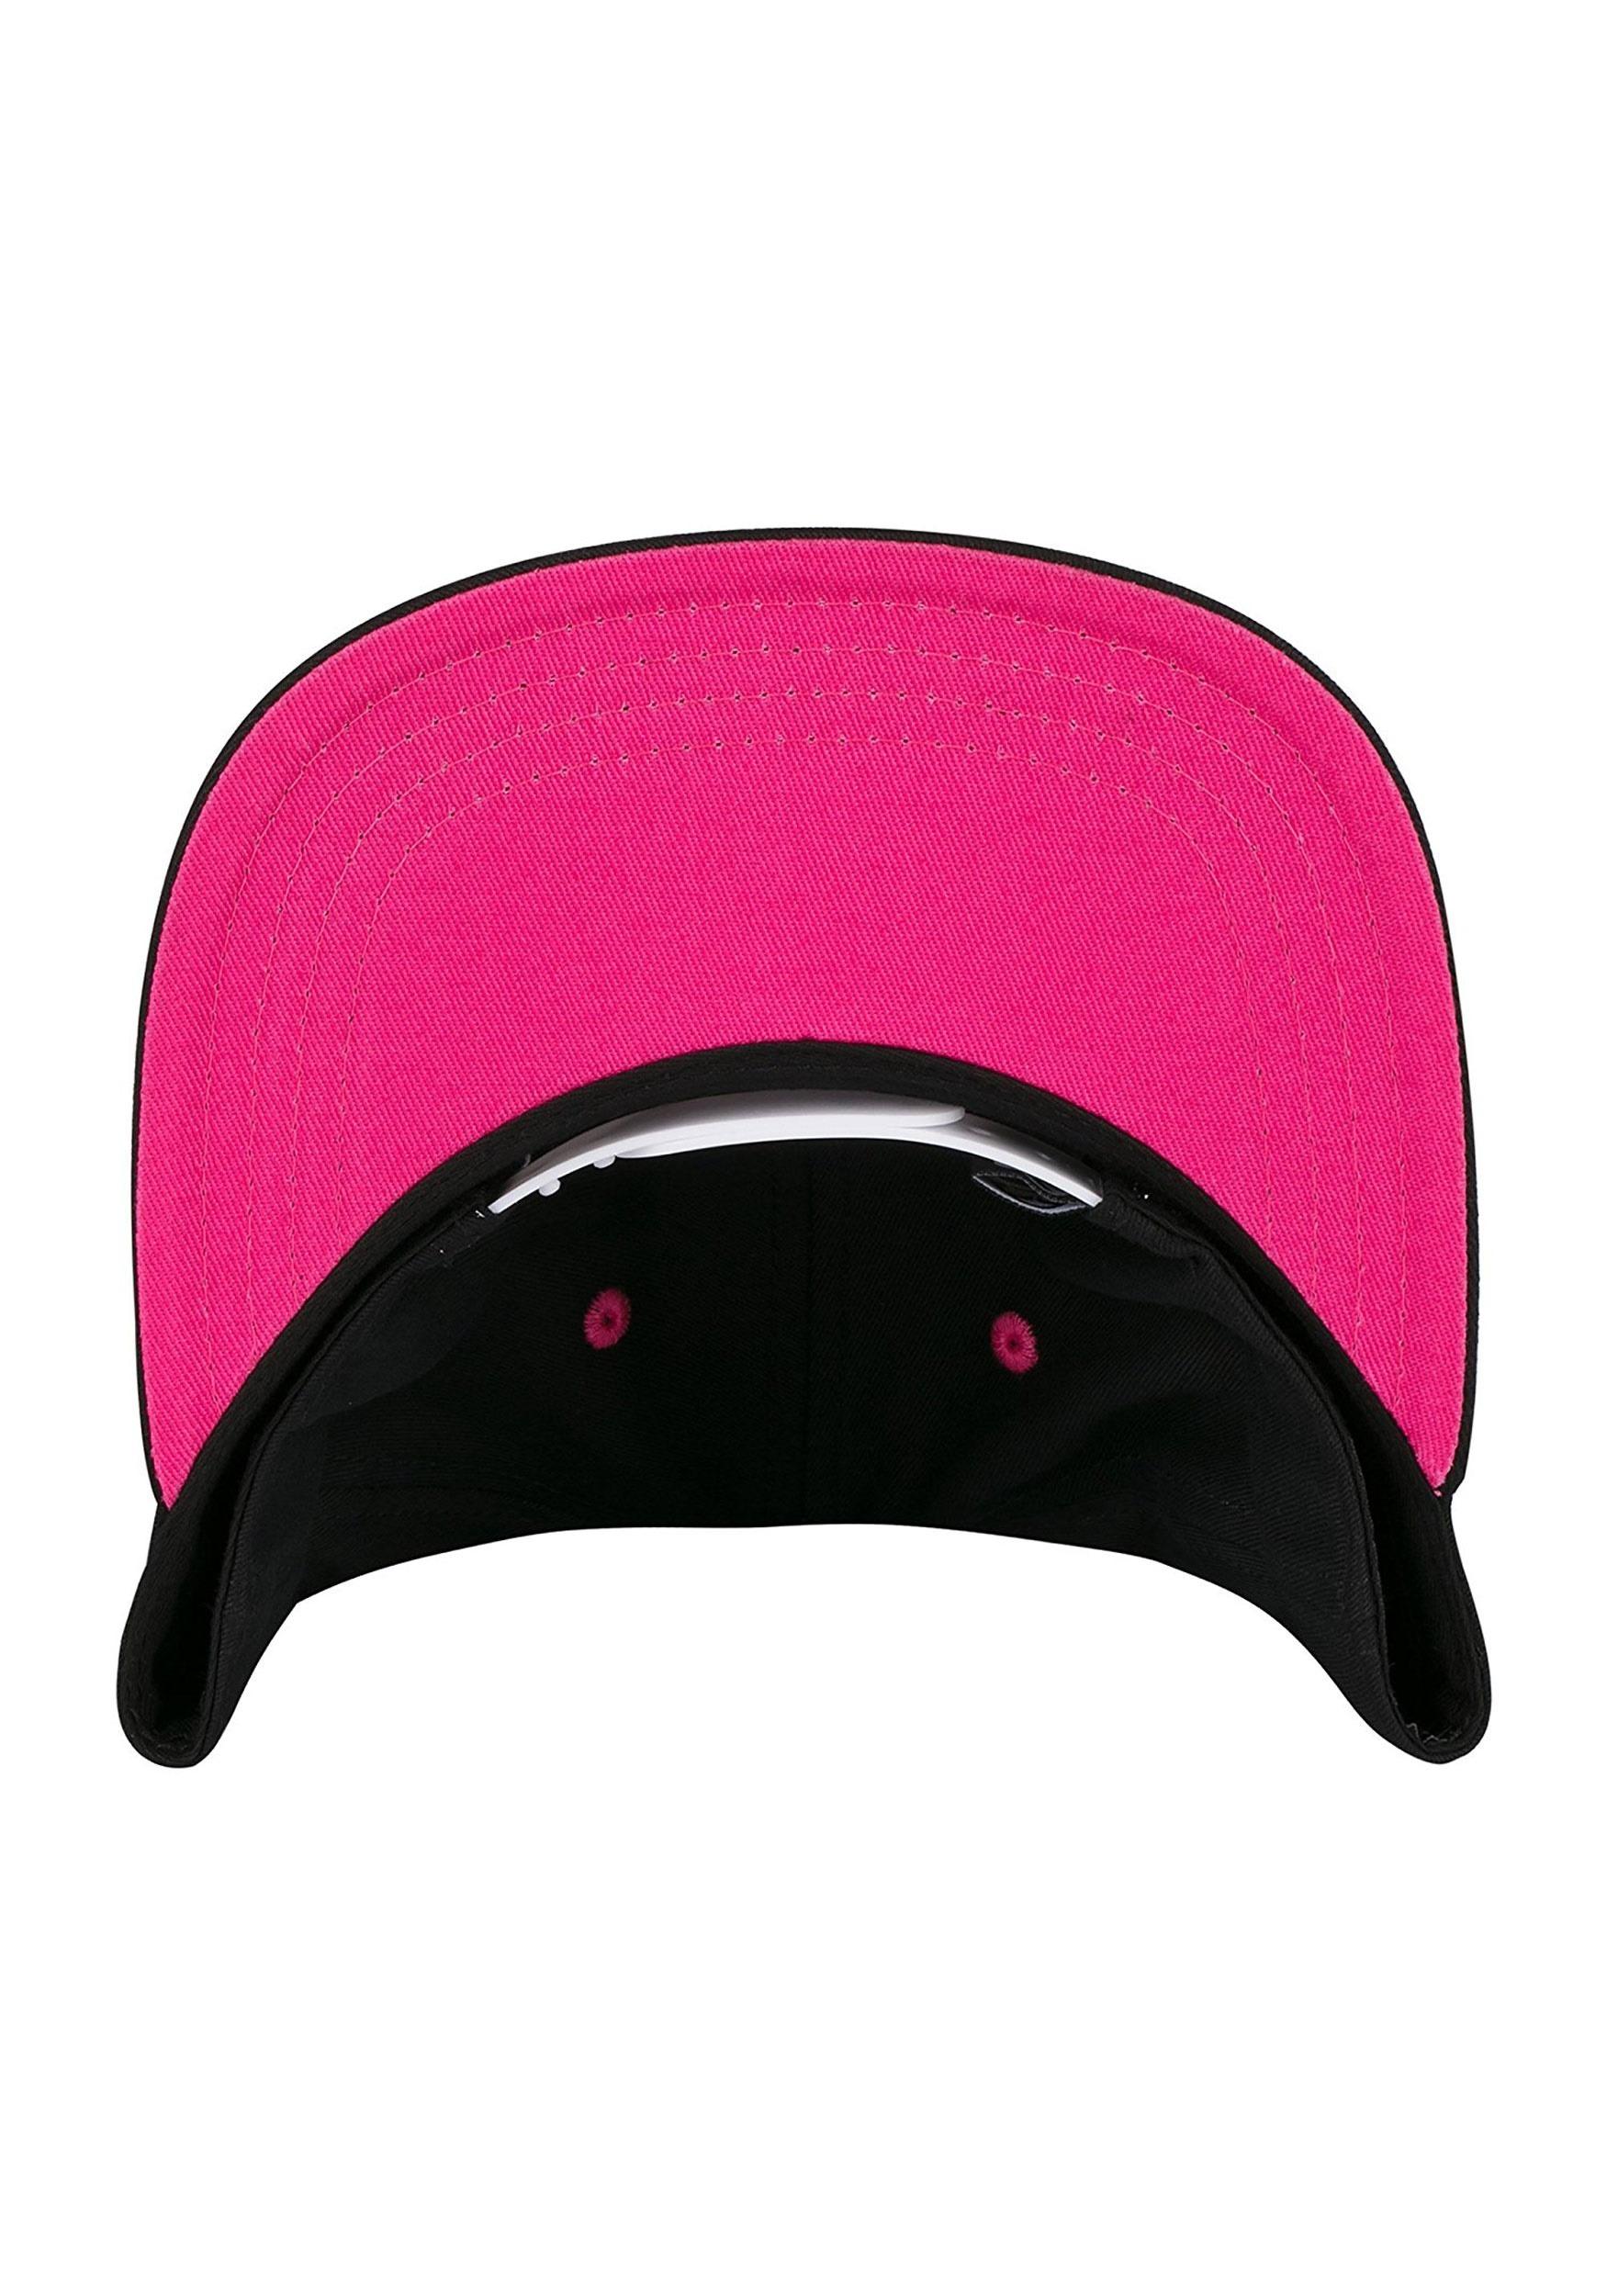 25cb5b6f0 Overwatch D.Va Bunny Snap-back Hat